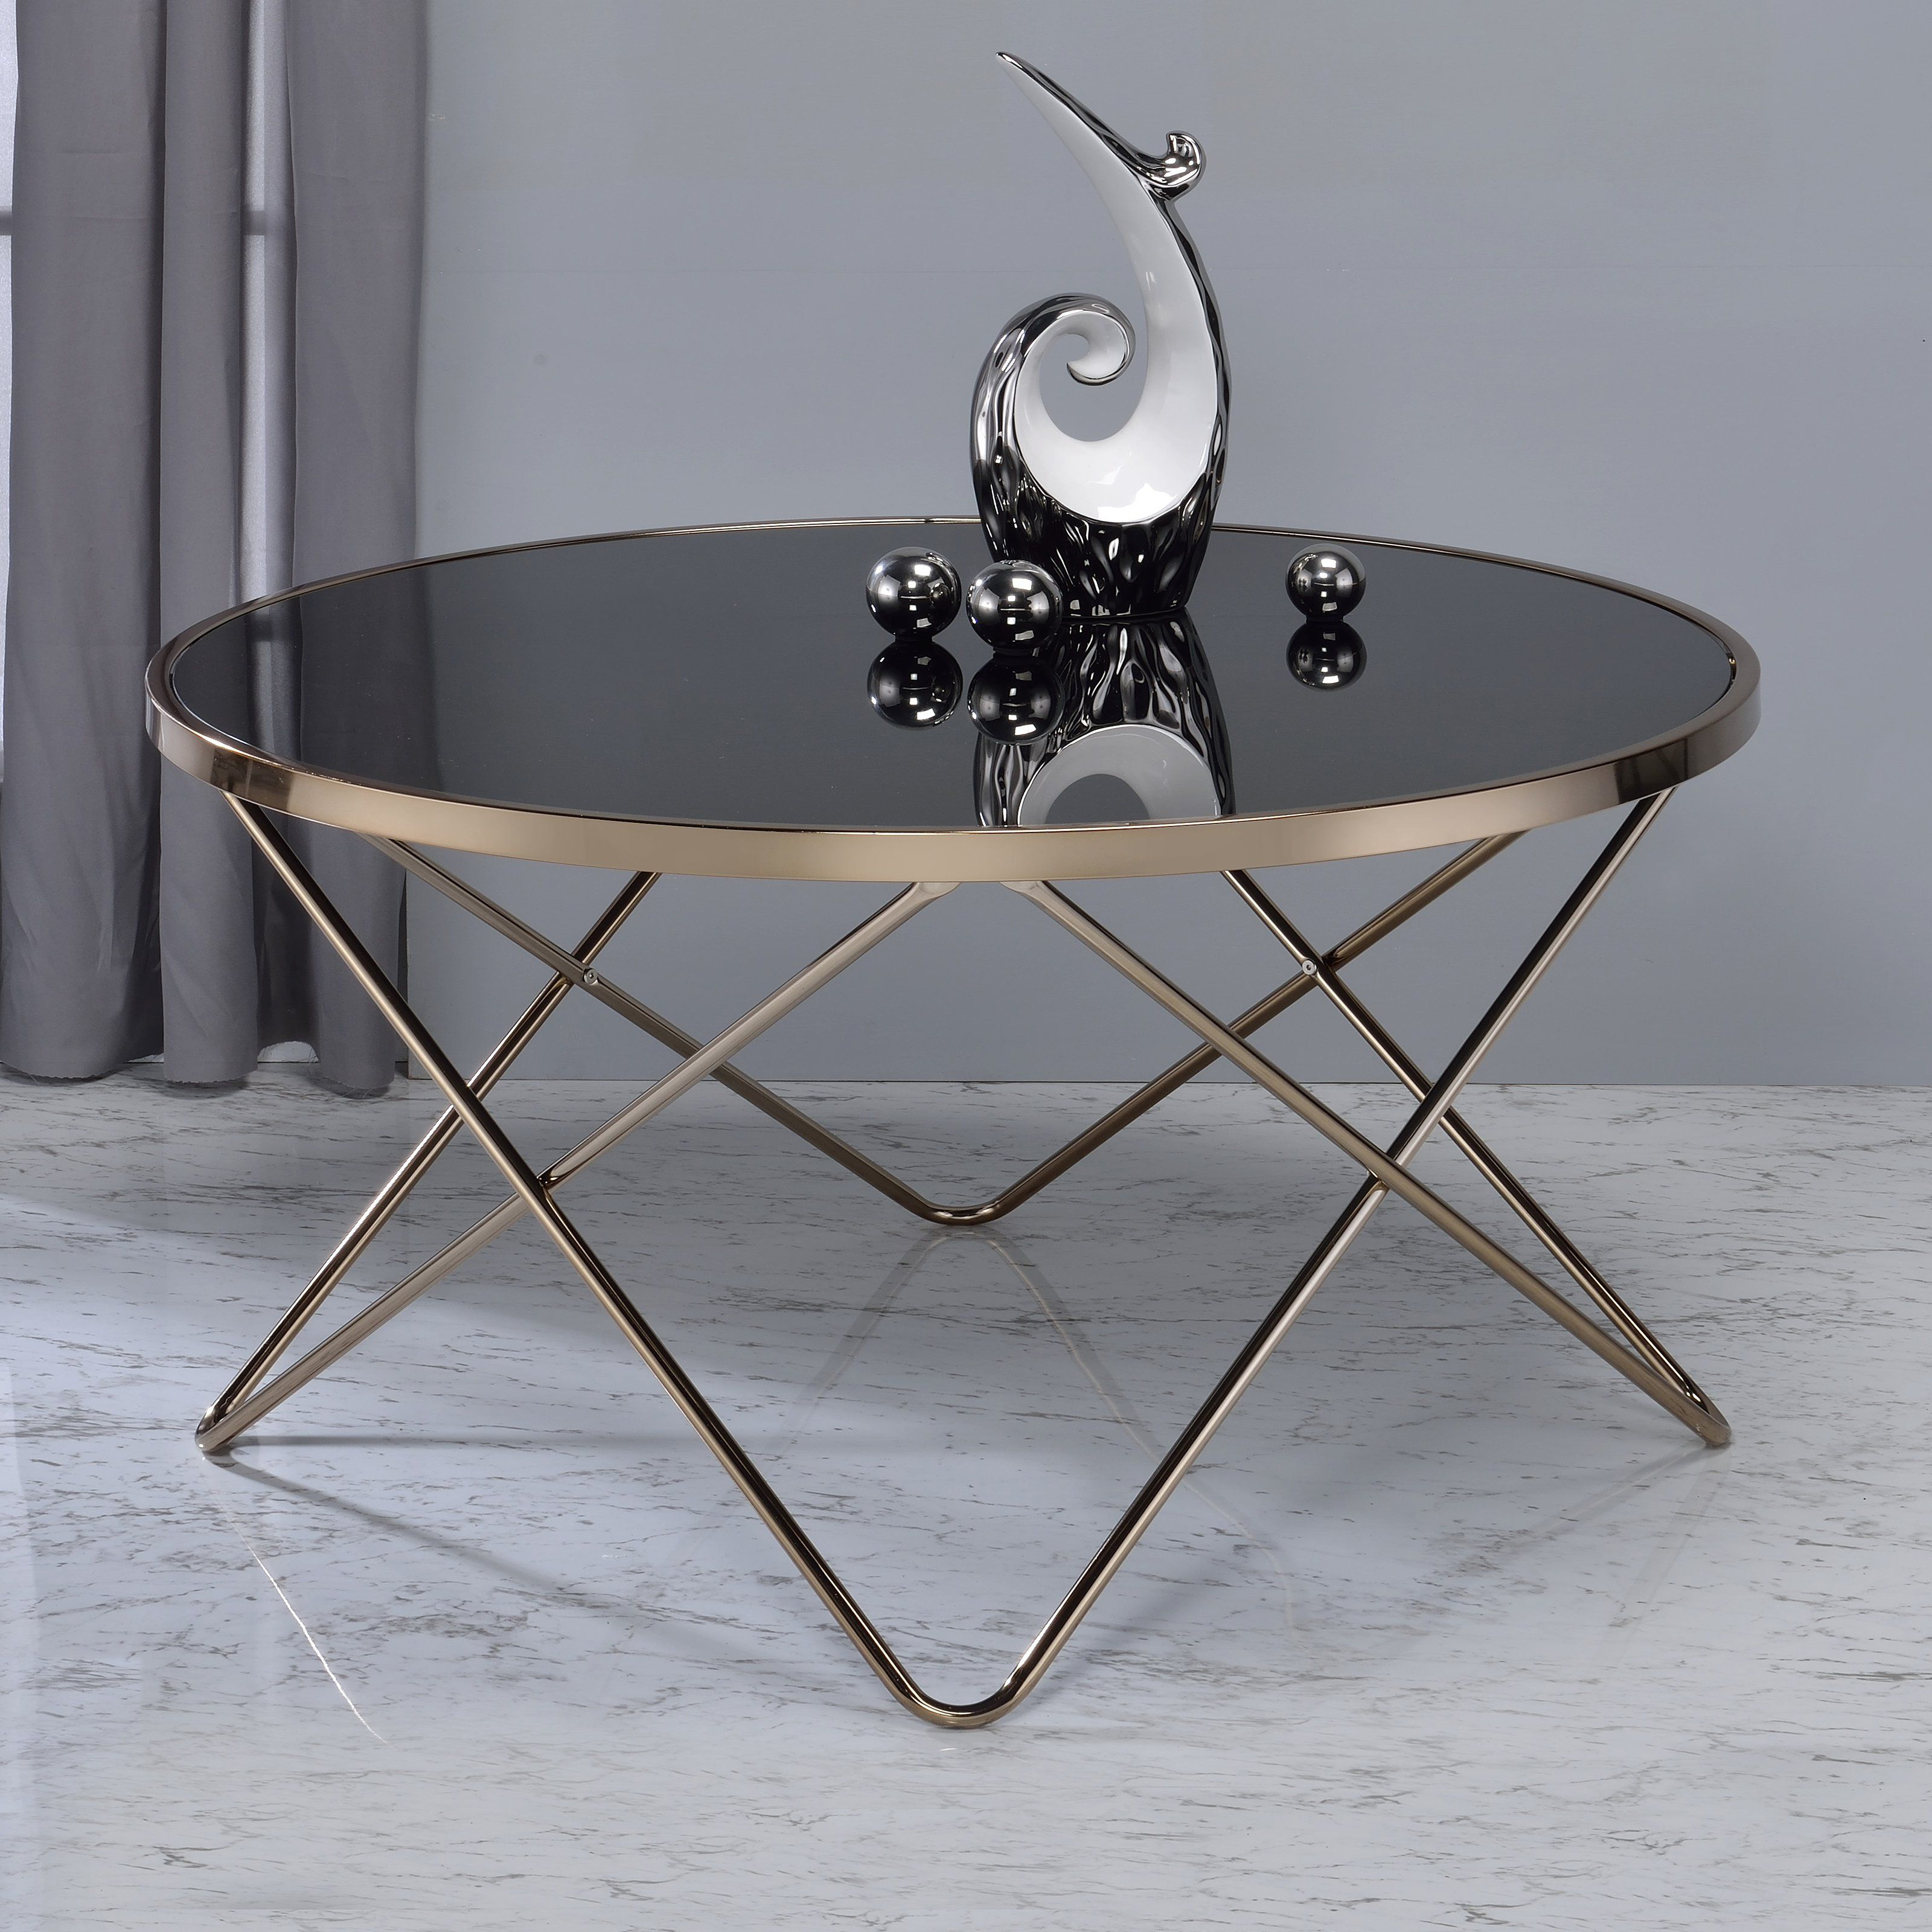 Acme Valora Black Glass Coffee Table Black Glass Coffee Table Modern Glass Coffee Table Round Coffee Table [ 3200 x 3200 Pixel ]